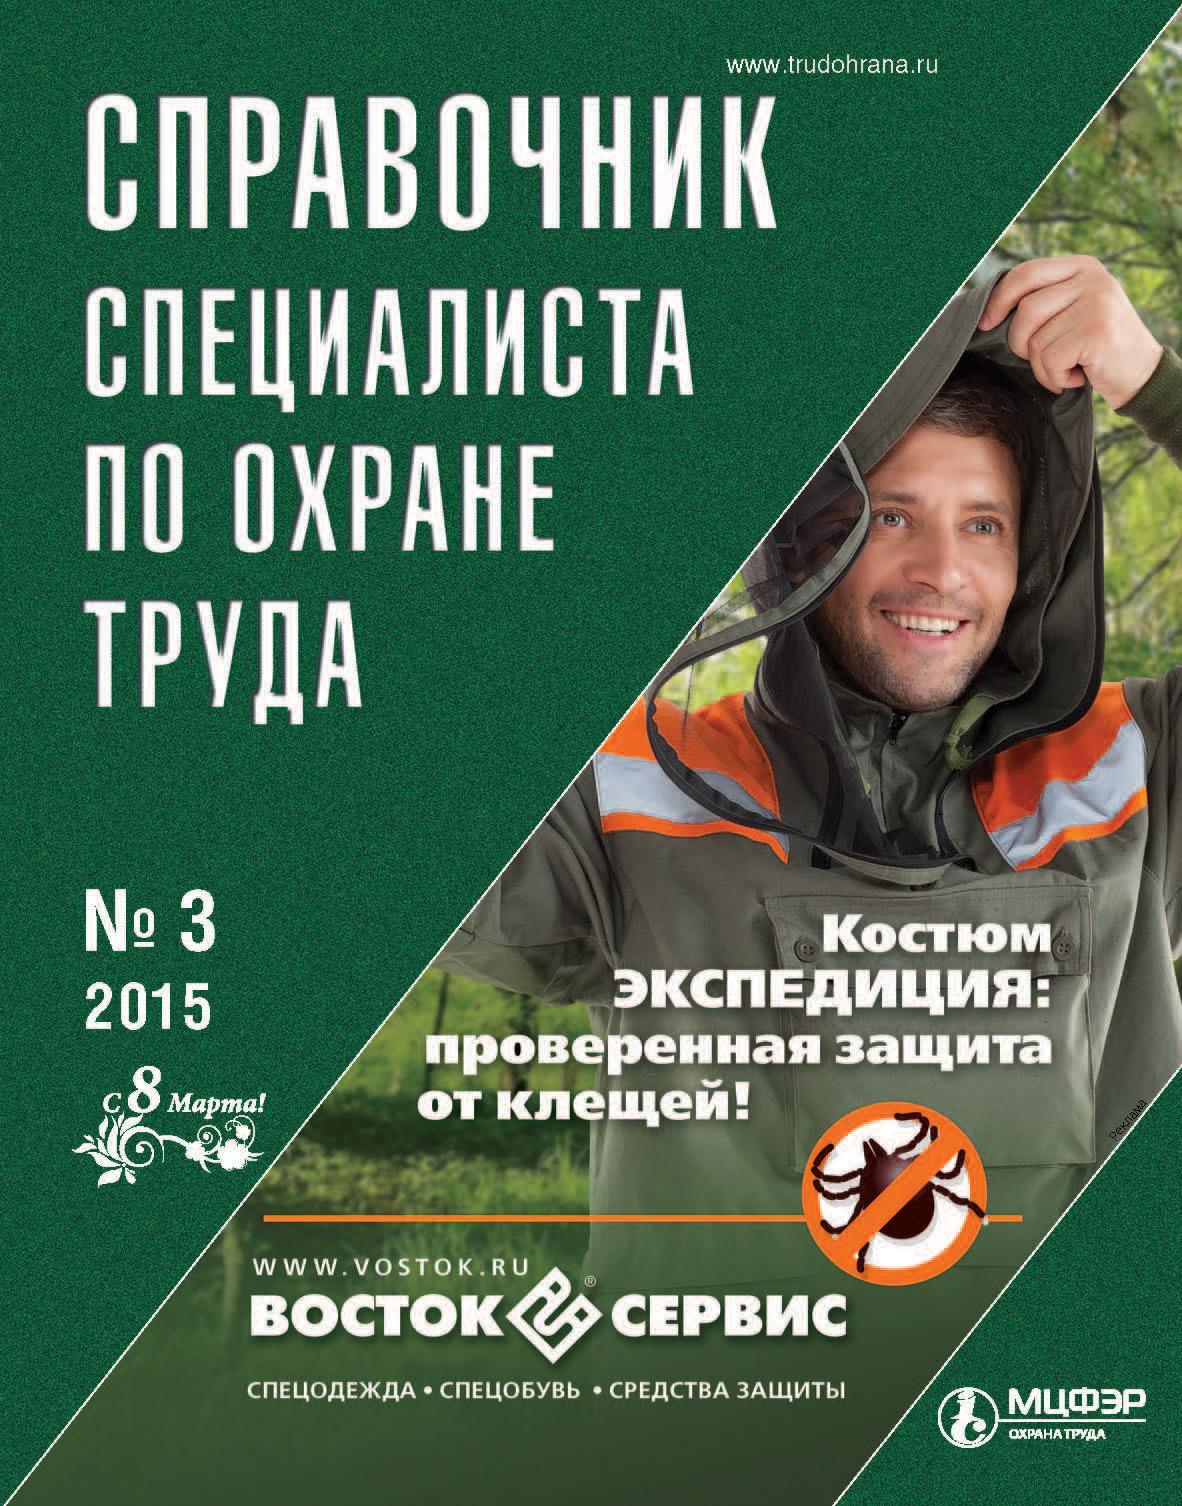 Справочник специалиста по охране труда № 3 2015